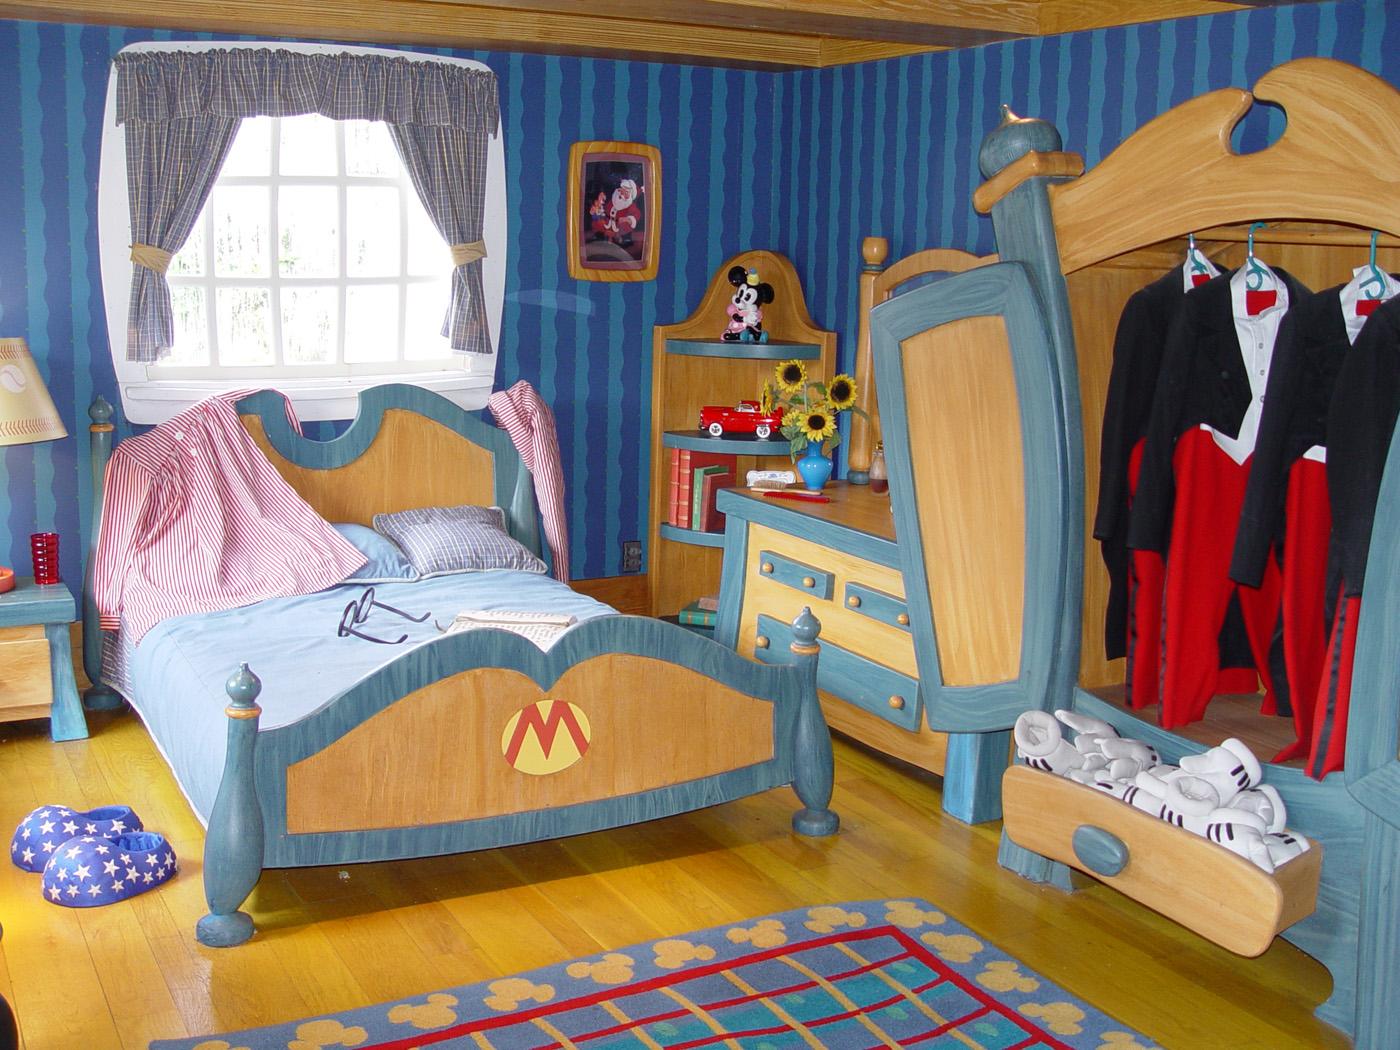 005-Mickeys-House